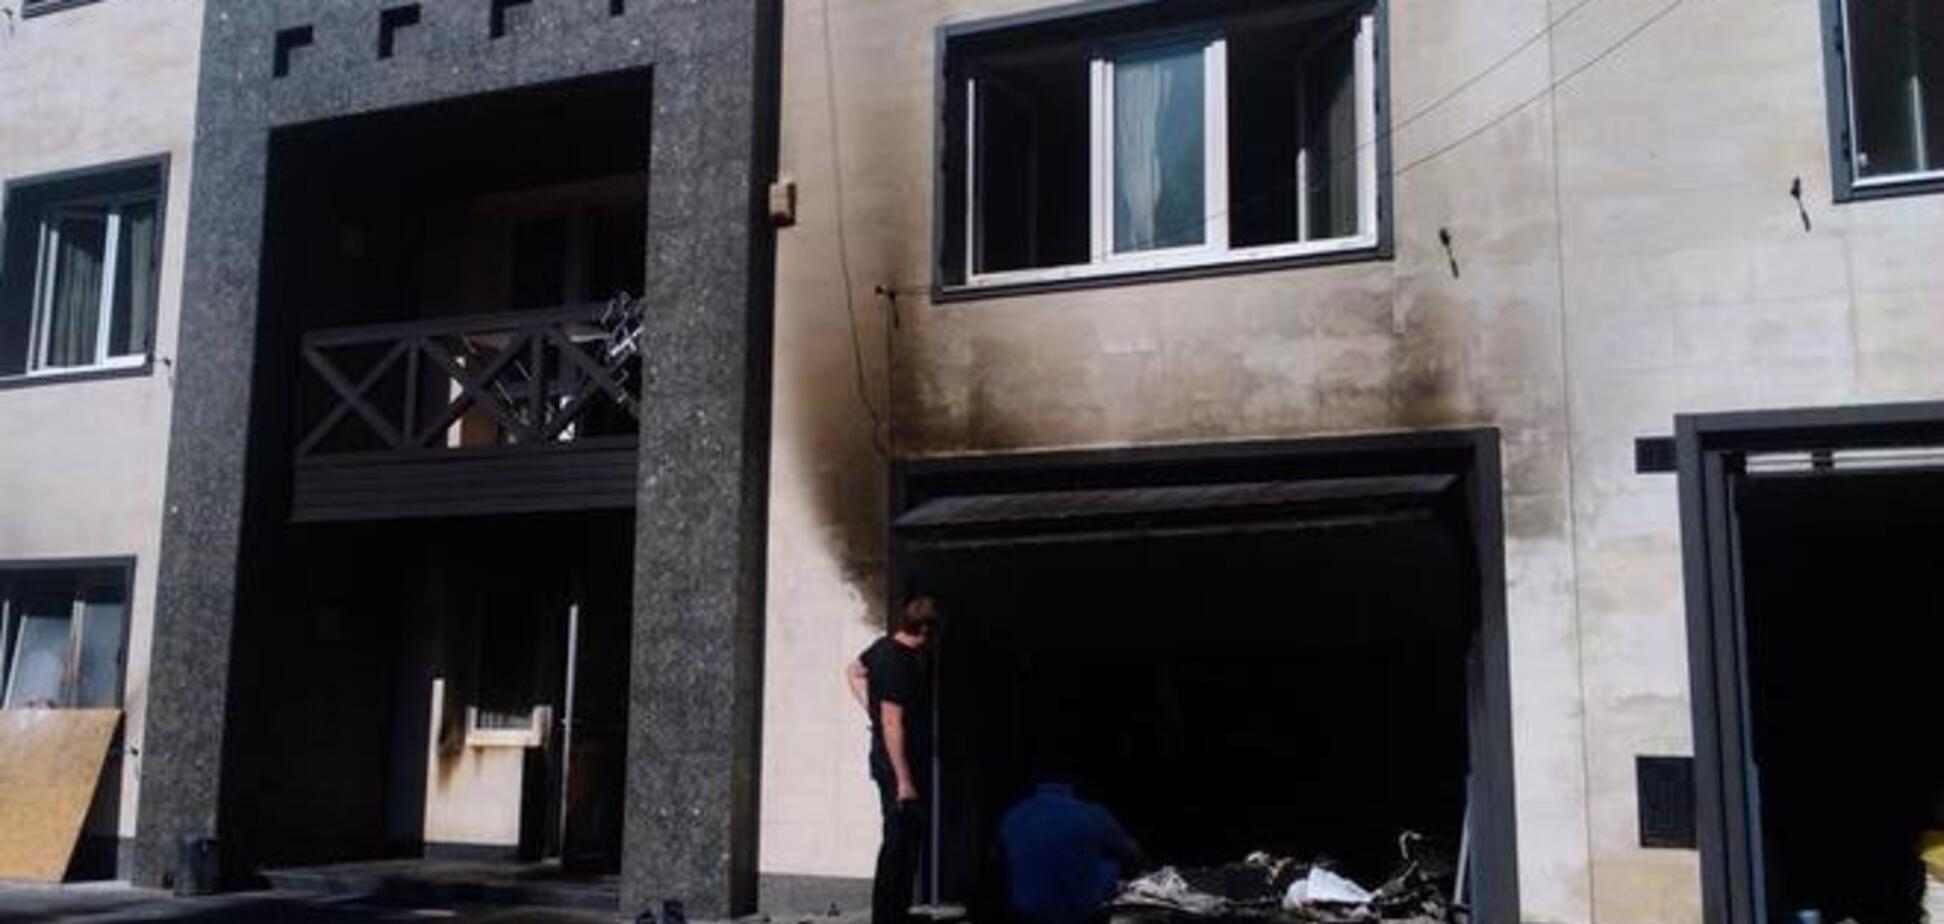 Дом Царева забросали 'коктейлями Молотова' и сожгли